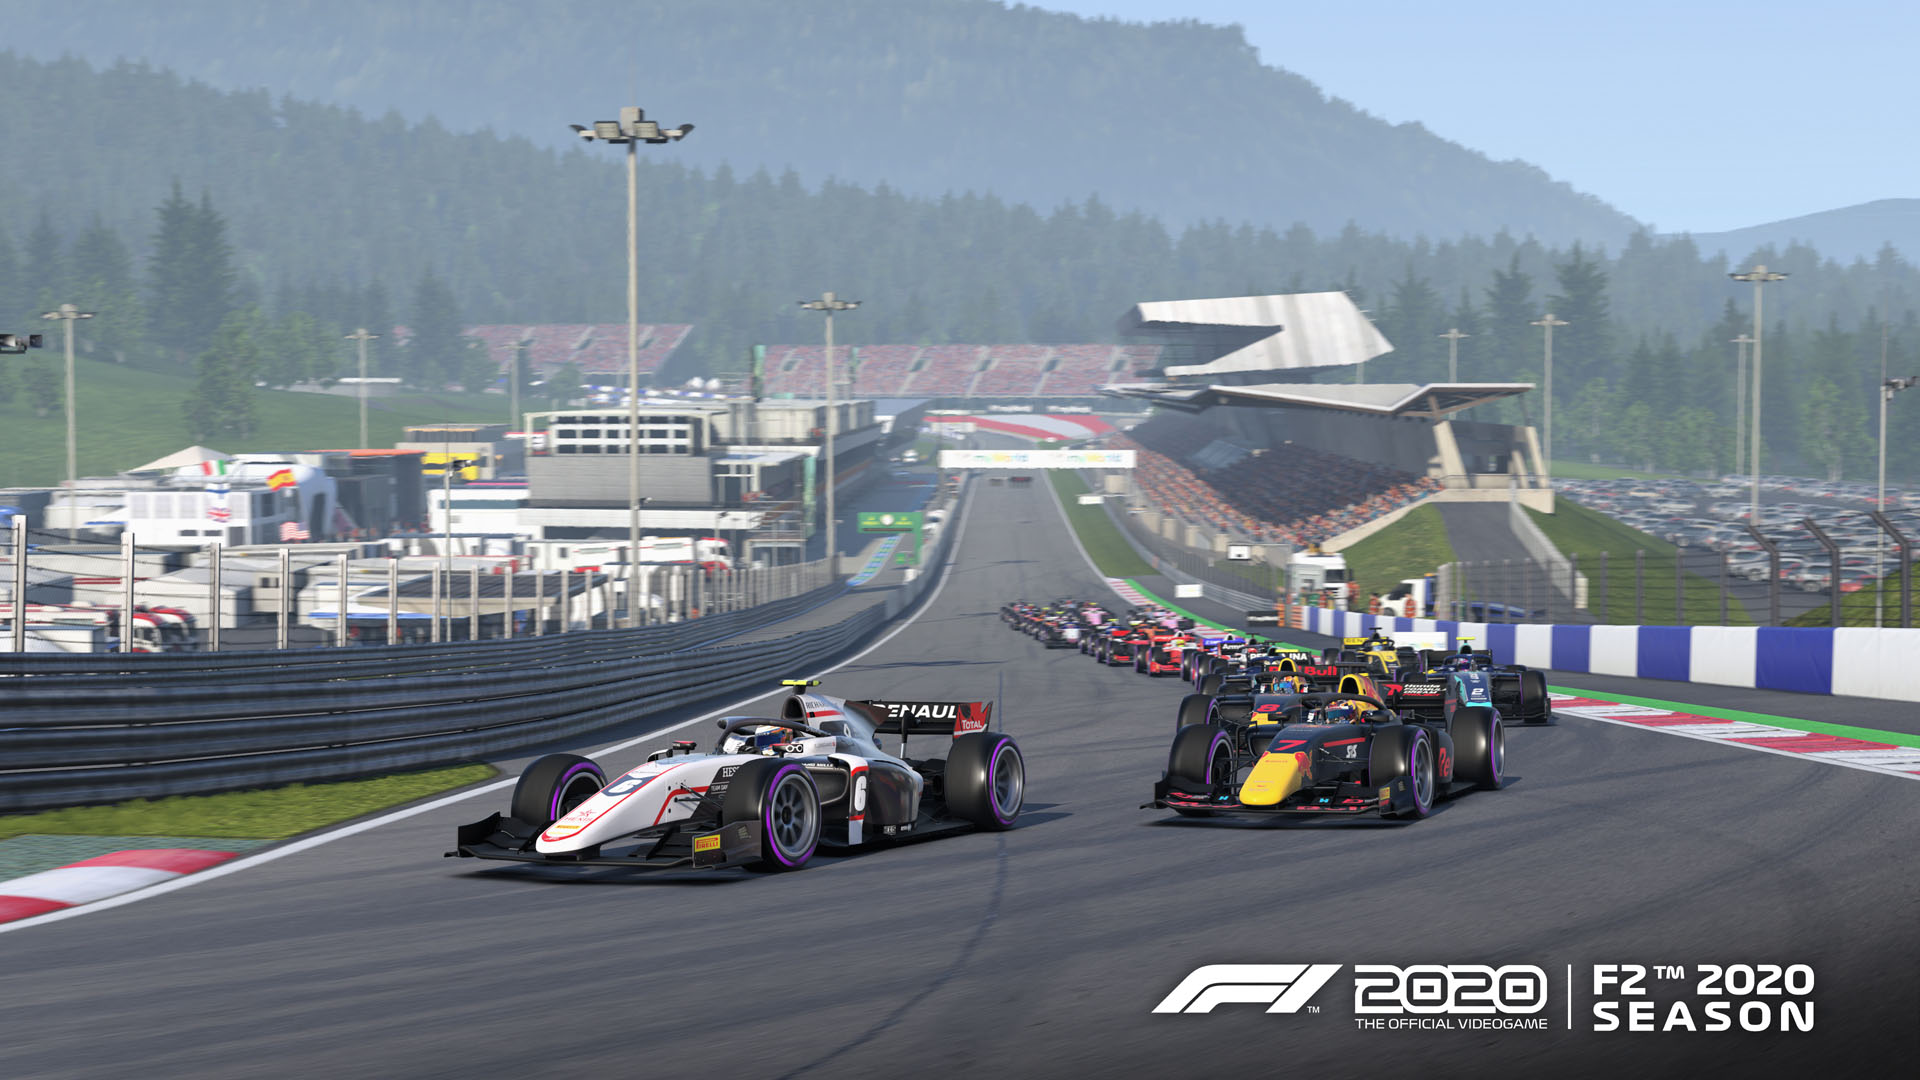 F2™ 2020